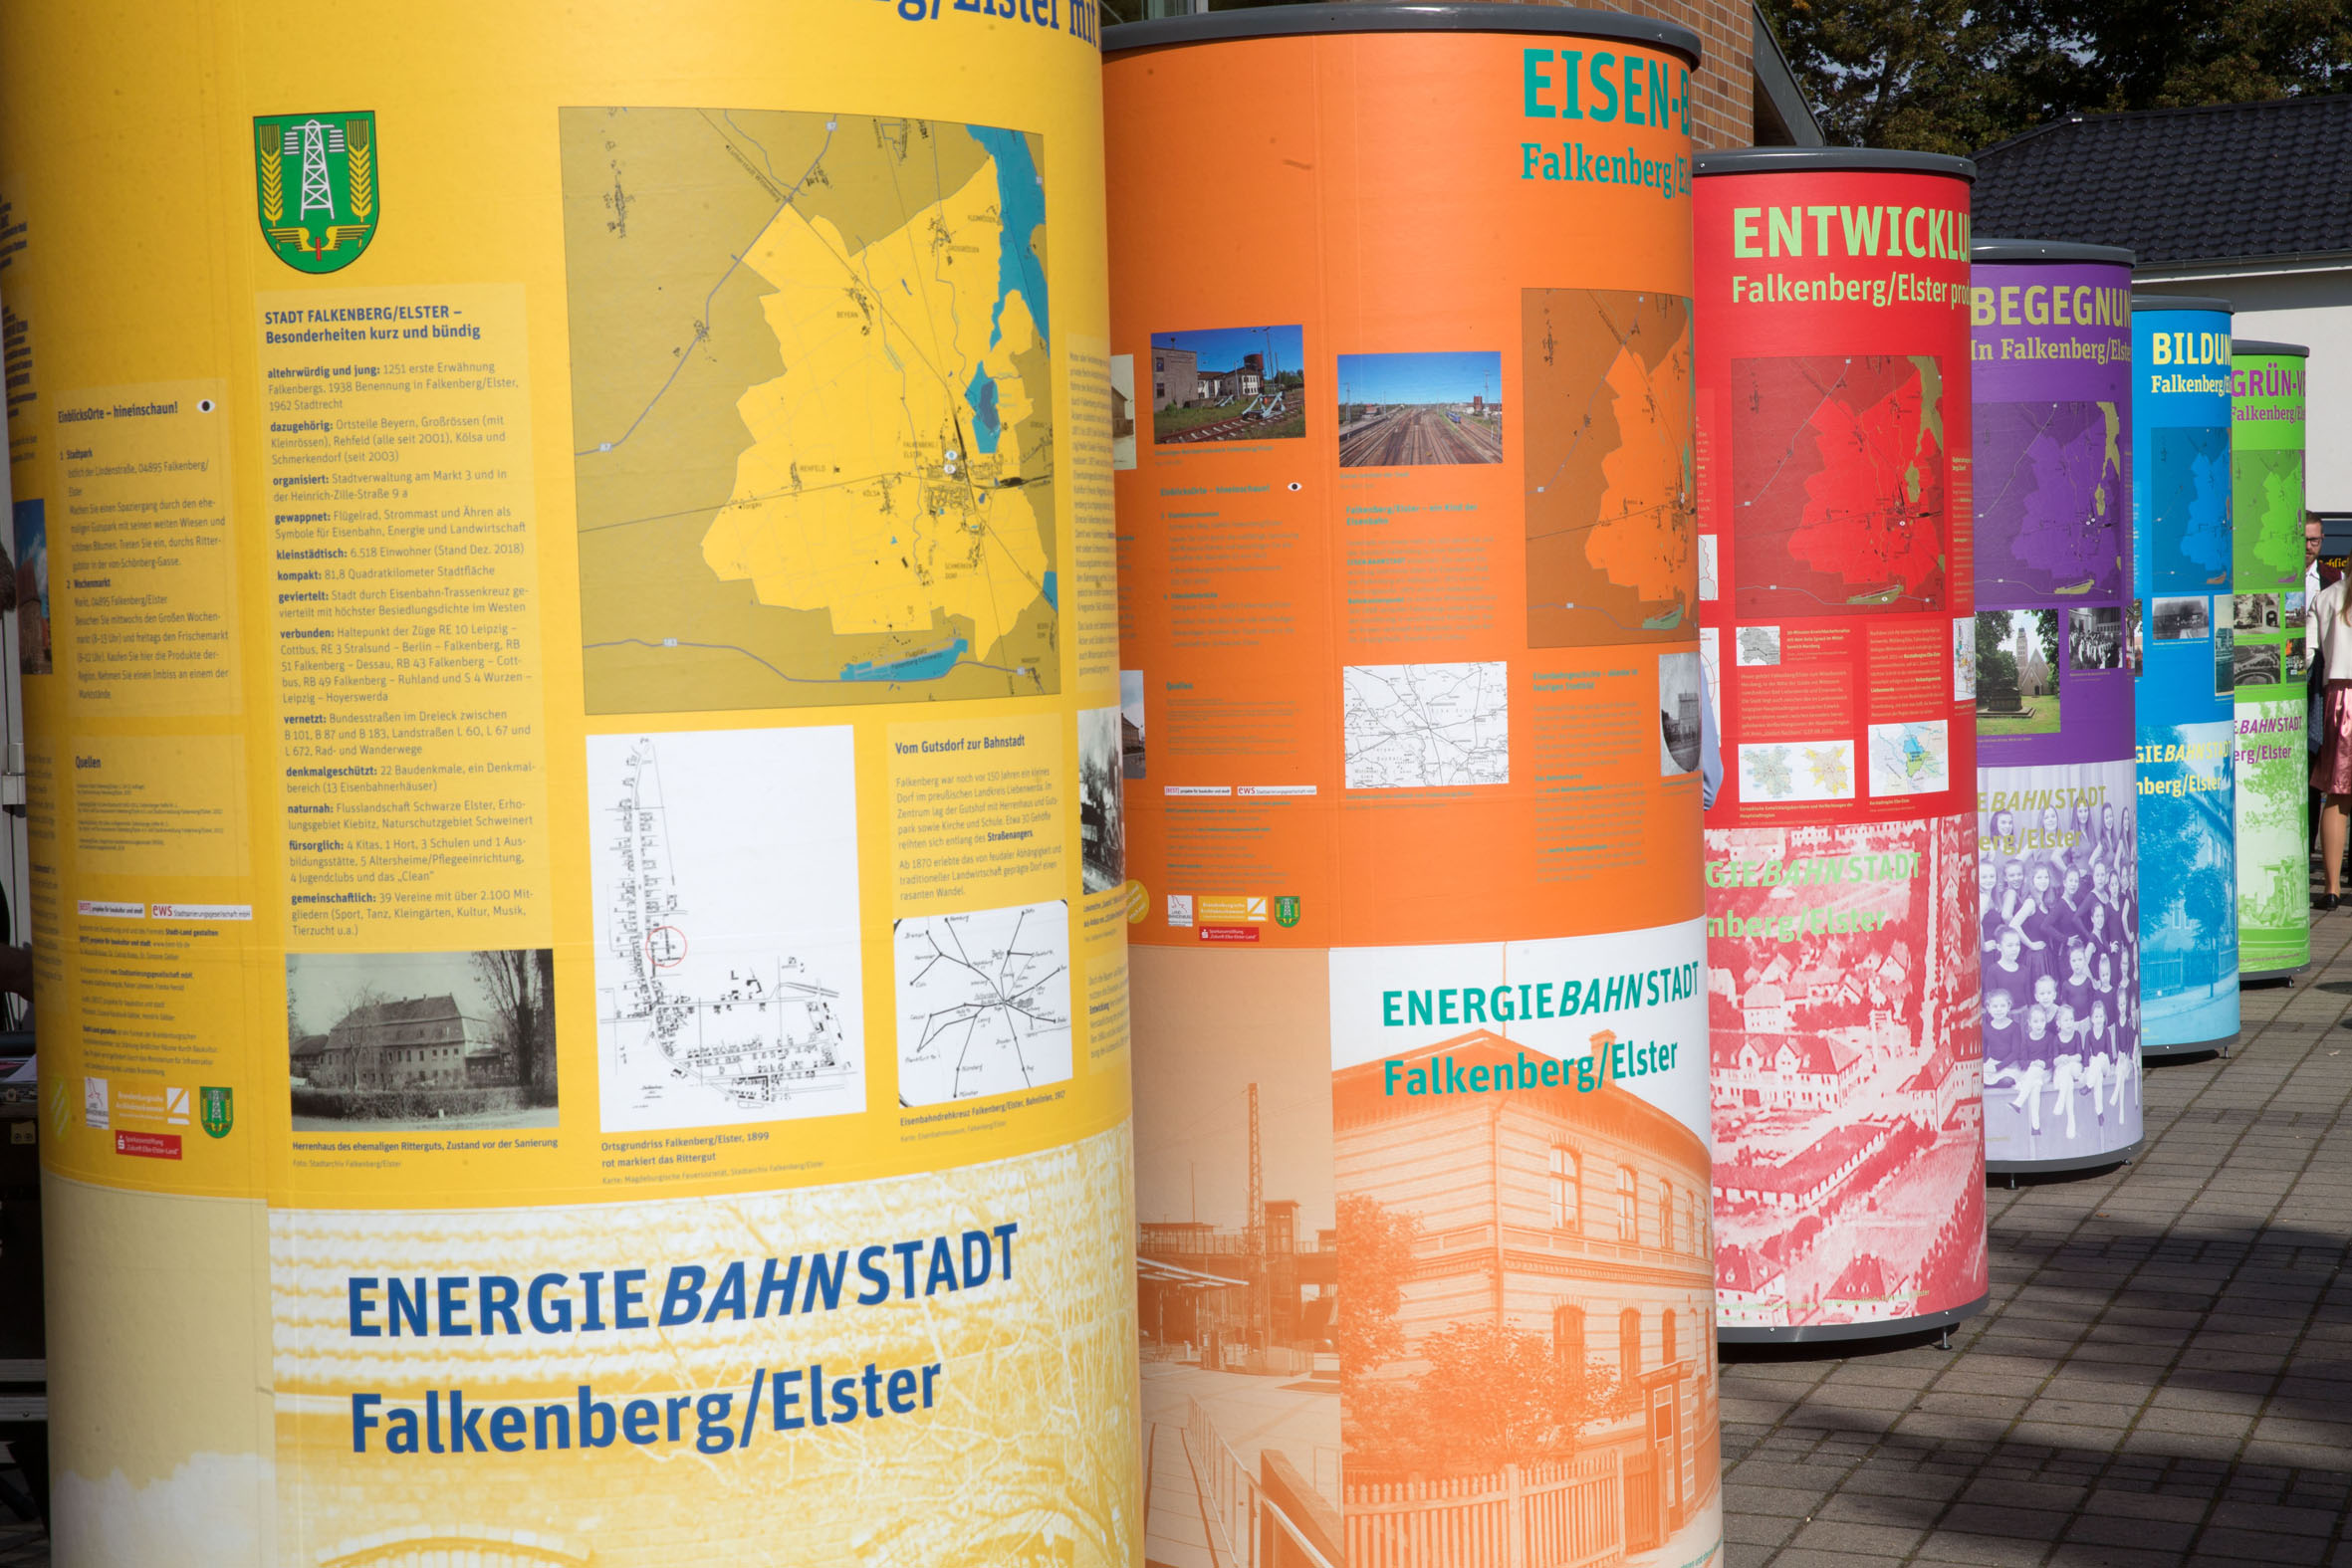 ENERGIEBAHNSTADT Falkenberg/Elster